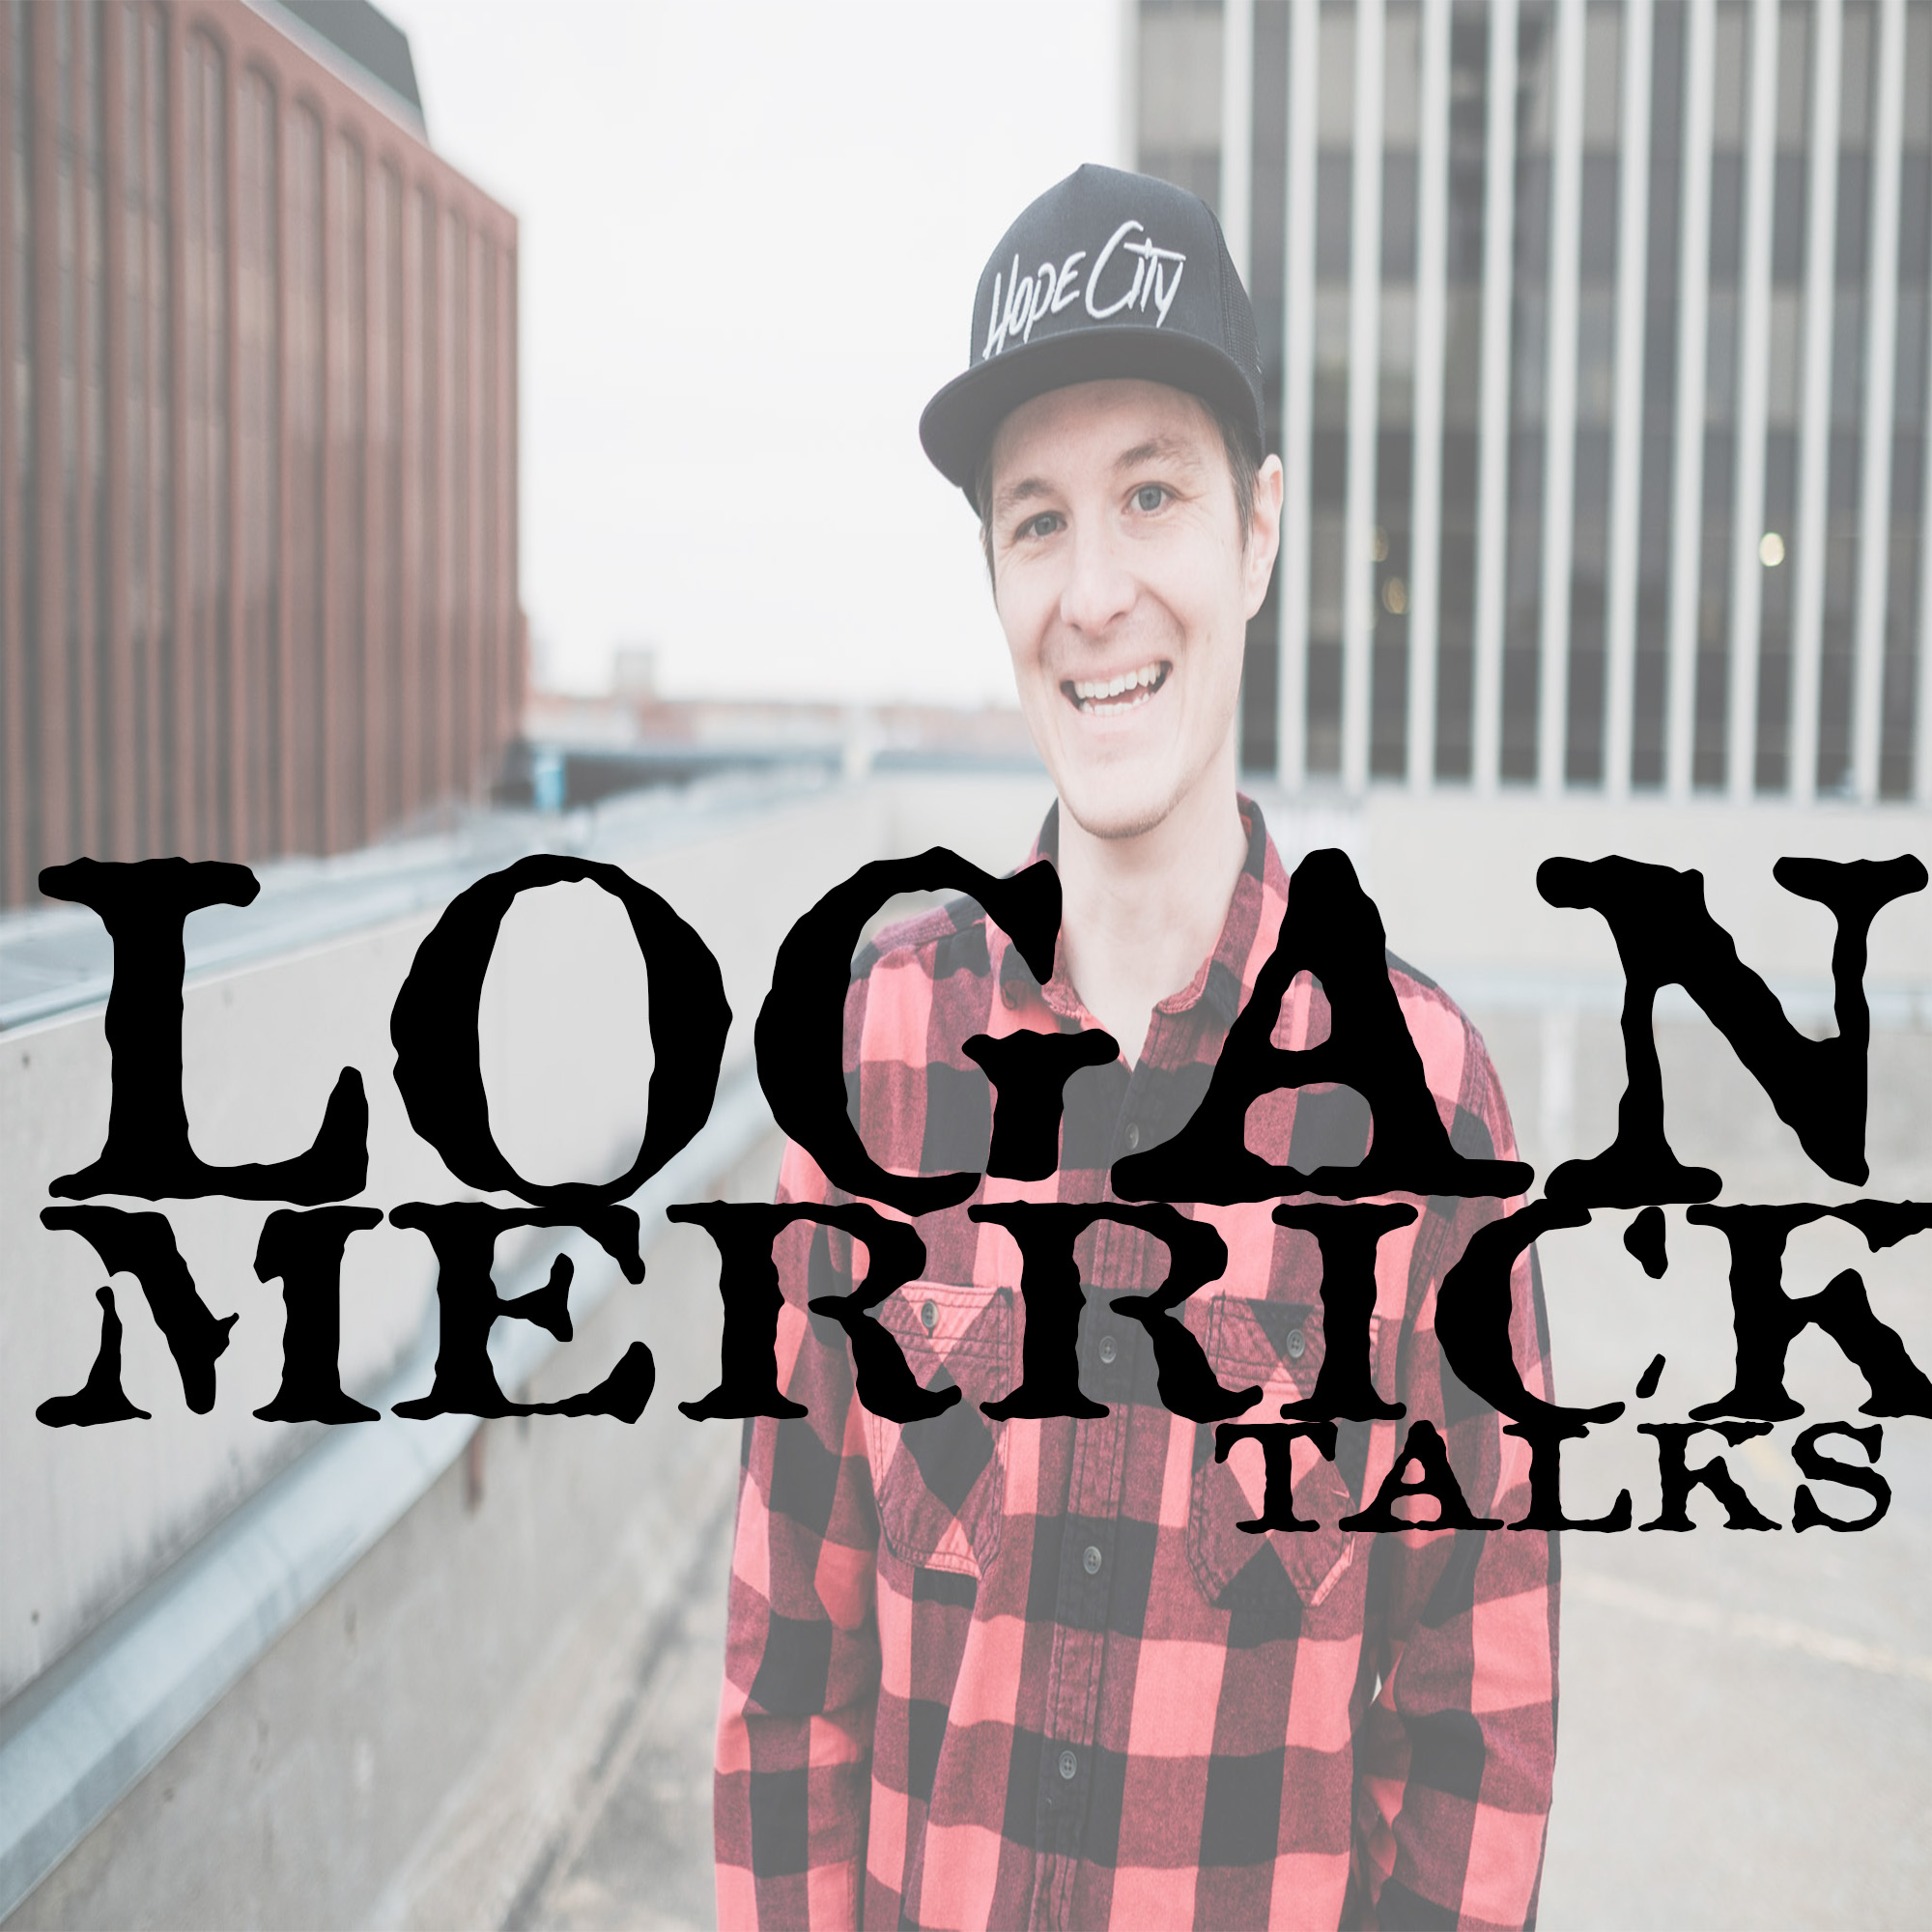 LOGAN MERRICK TALKS PODCAST logo